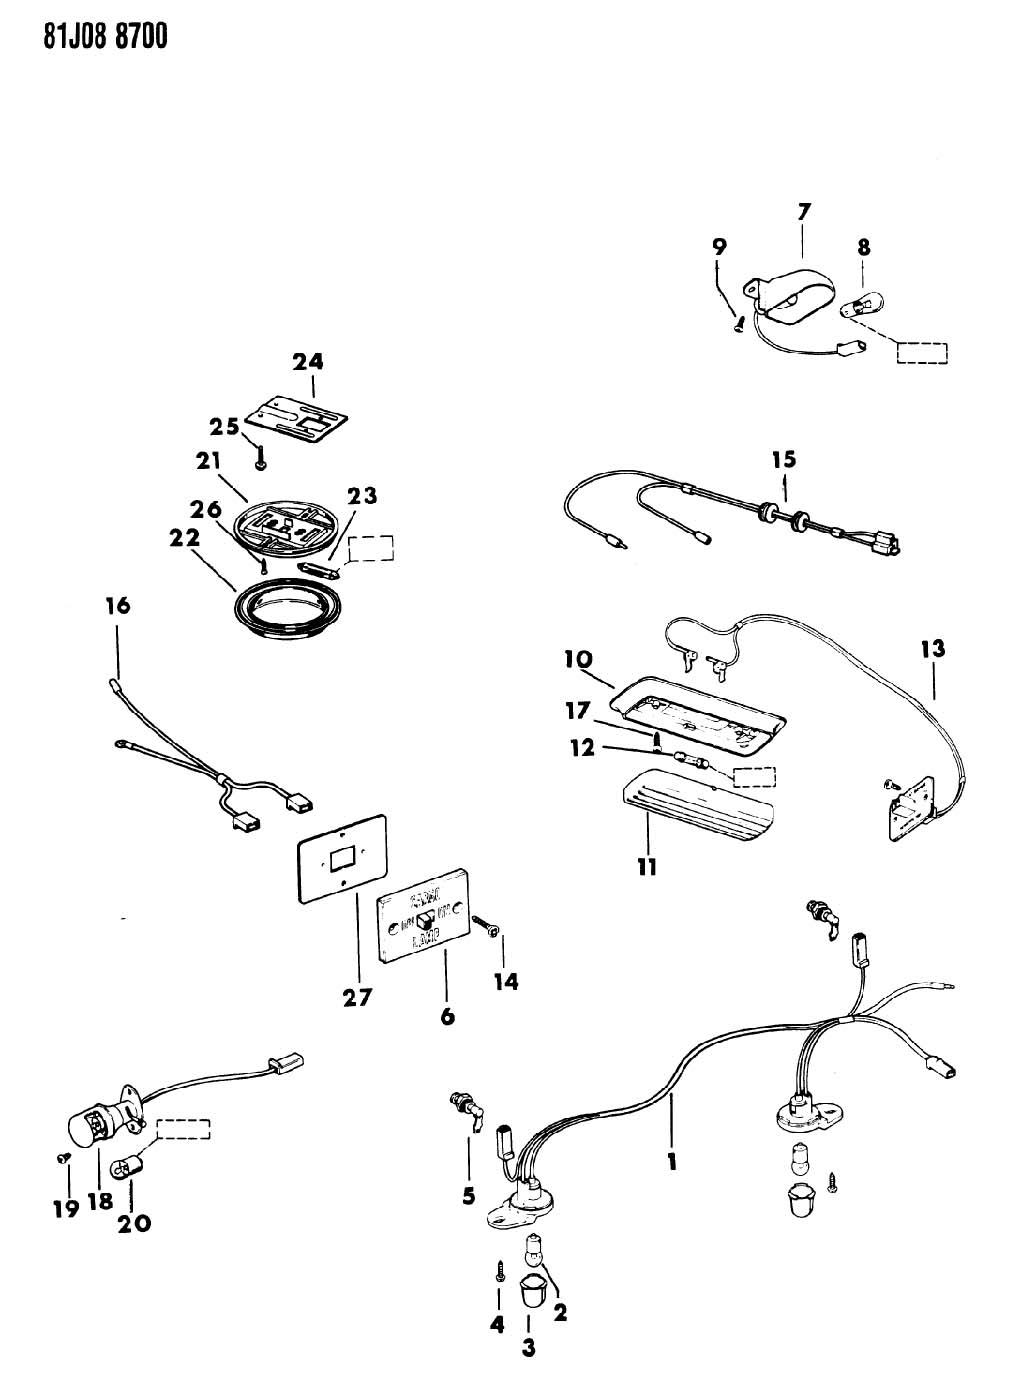 Jeep Cherokee Lamp Underhood Lamp Underhood Plastic